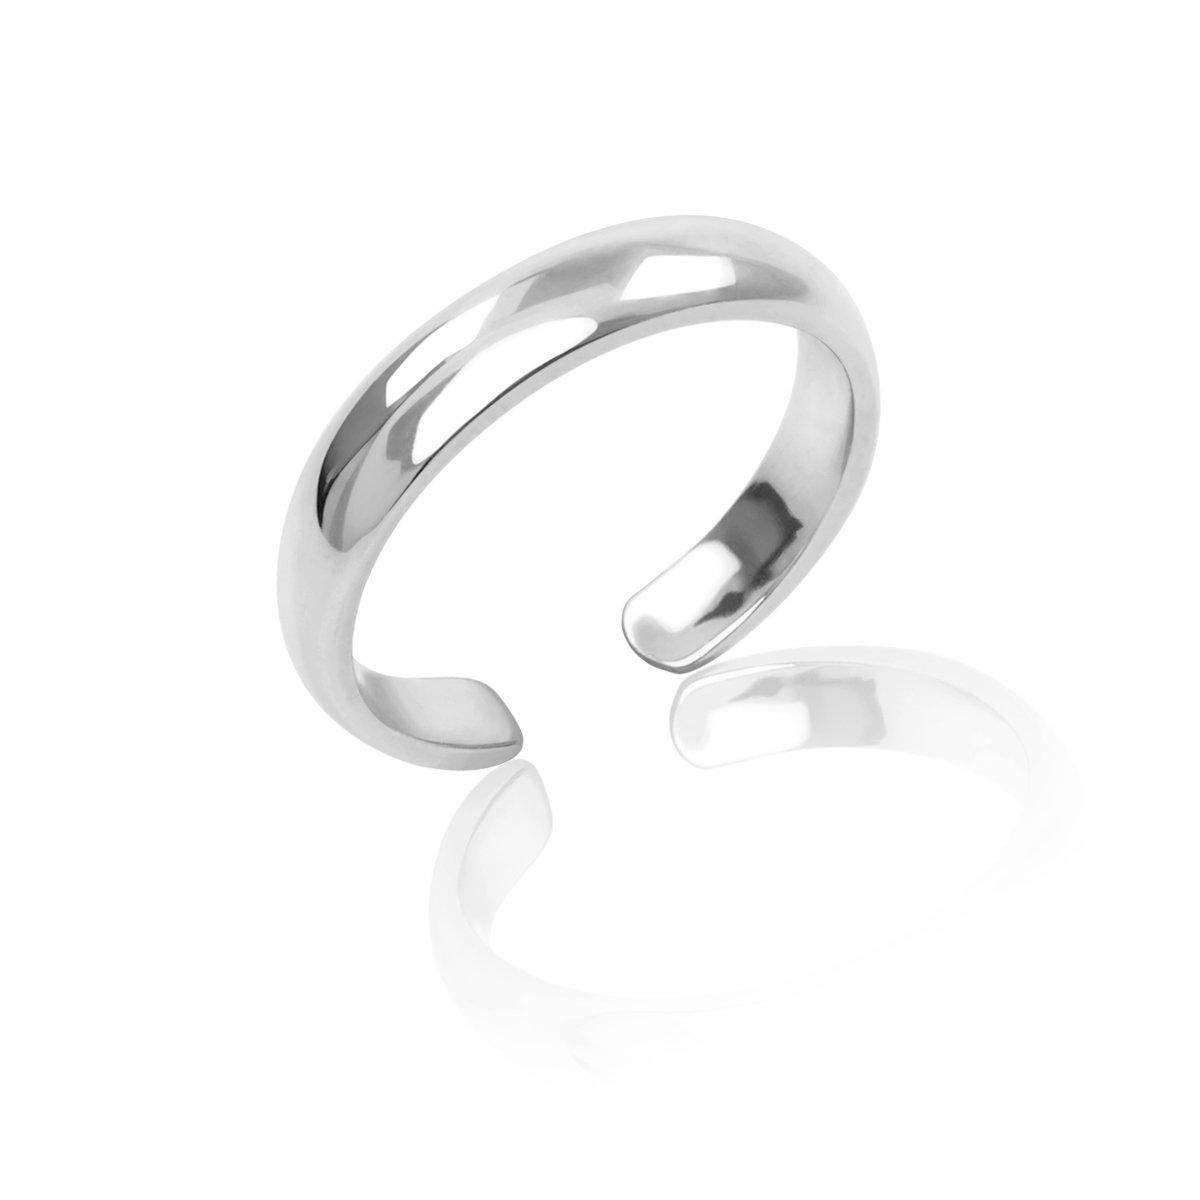 Honolulu Jewelry Company Sterling Silver Band Toe Ring (3mm)